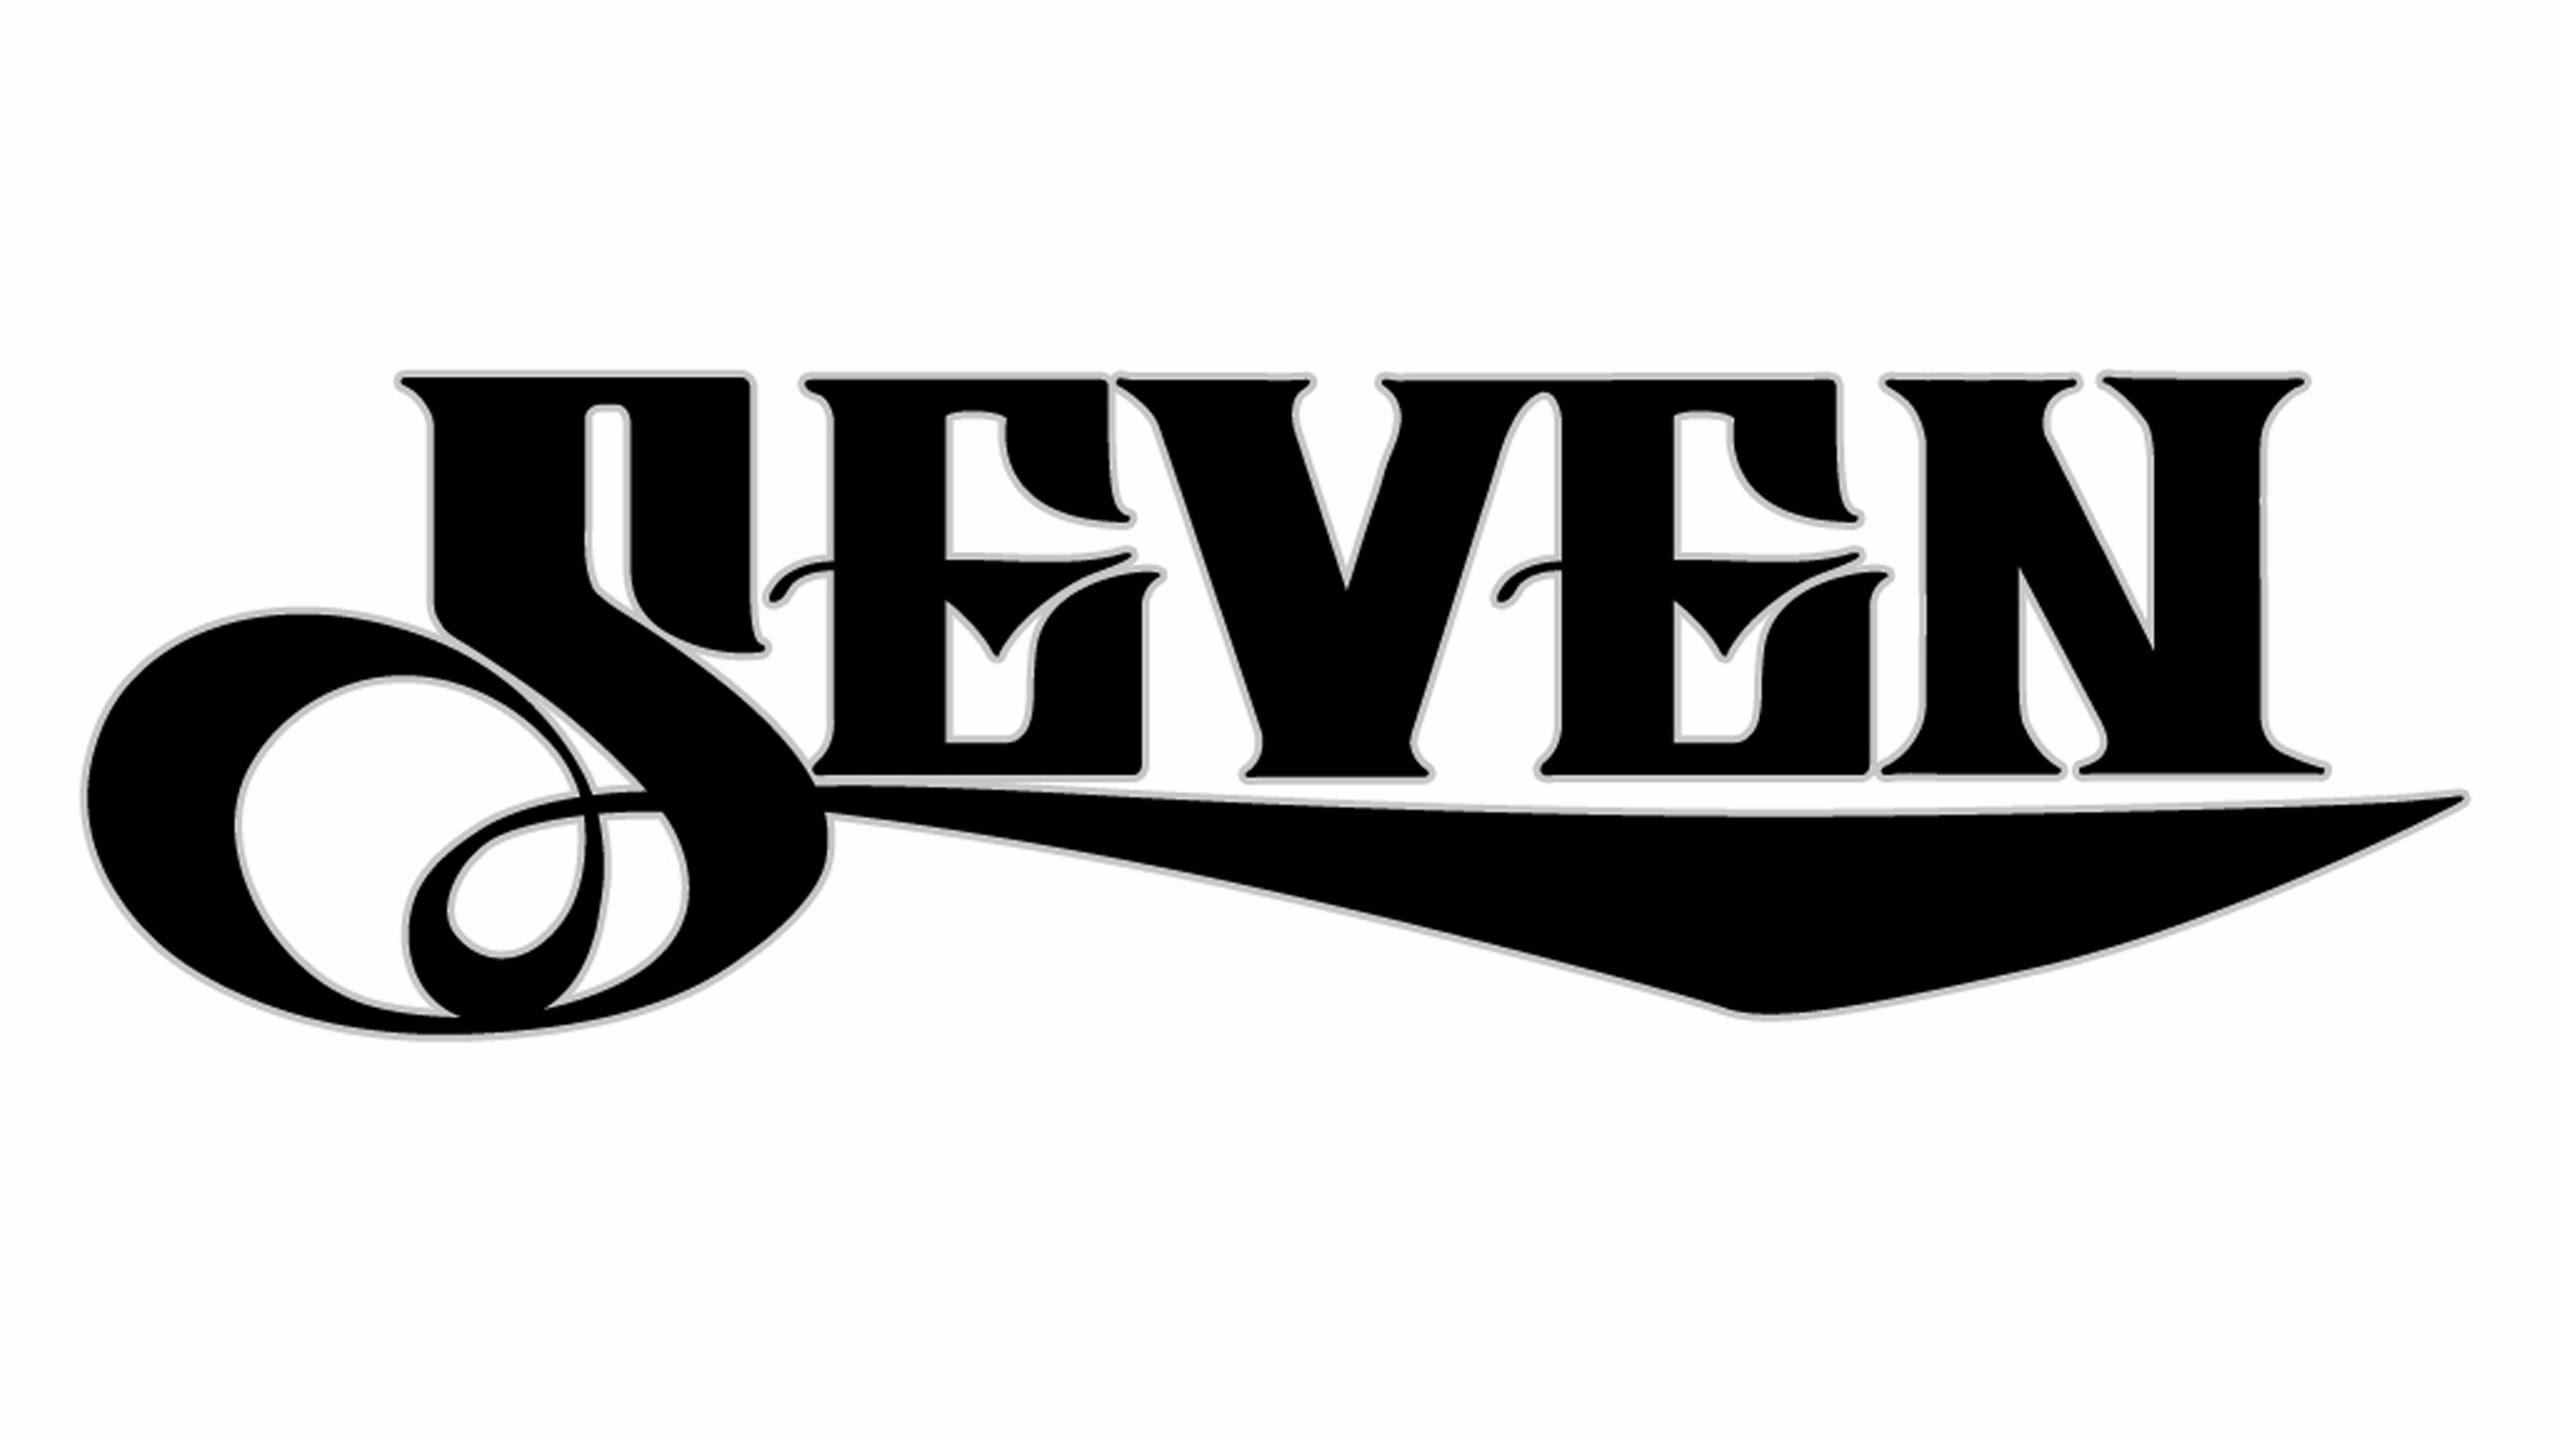 7 youtube logo-1